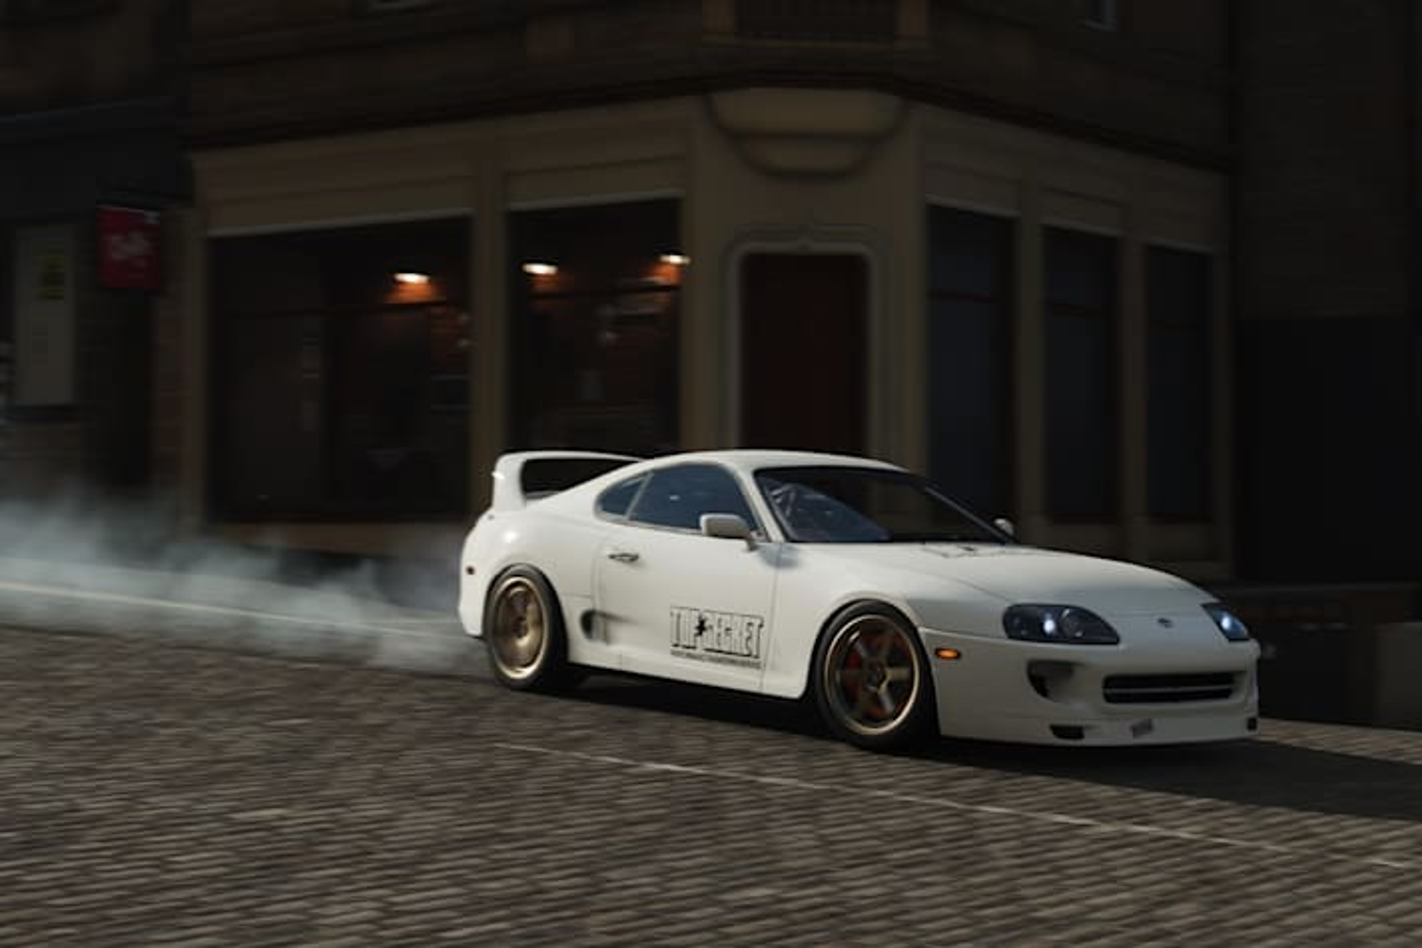 Common Game Cars Toyota Supra H Jpg